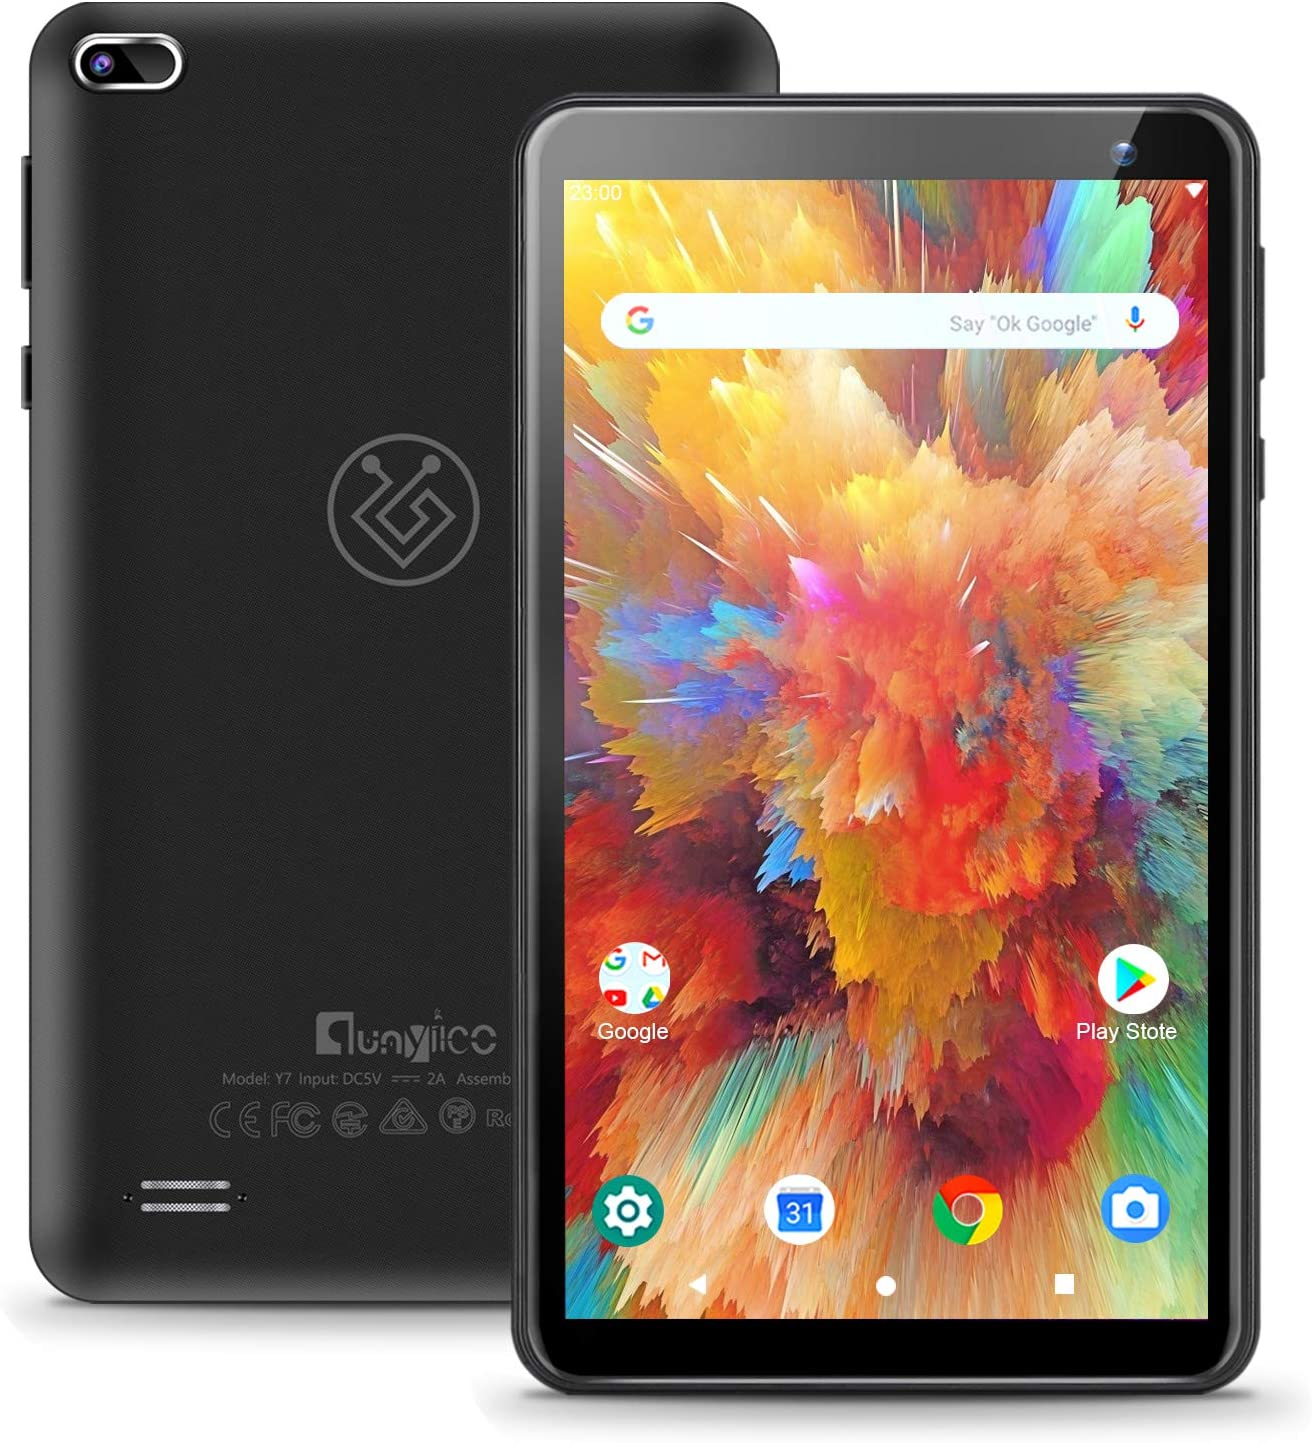 7 inch Android 10.0 Tablet qunyiCO Y7, 2GB RAM 32GB Storage, Dual Camera Quad-Core 1024 x 600 IPS HD Display Screen Bluetooth Wi-Fi Only, Google GMS Certified 3000mAh Black